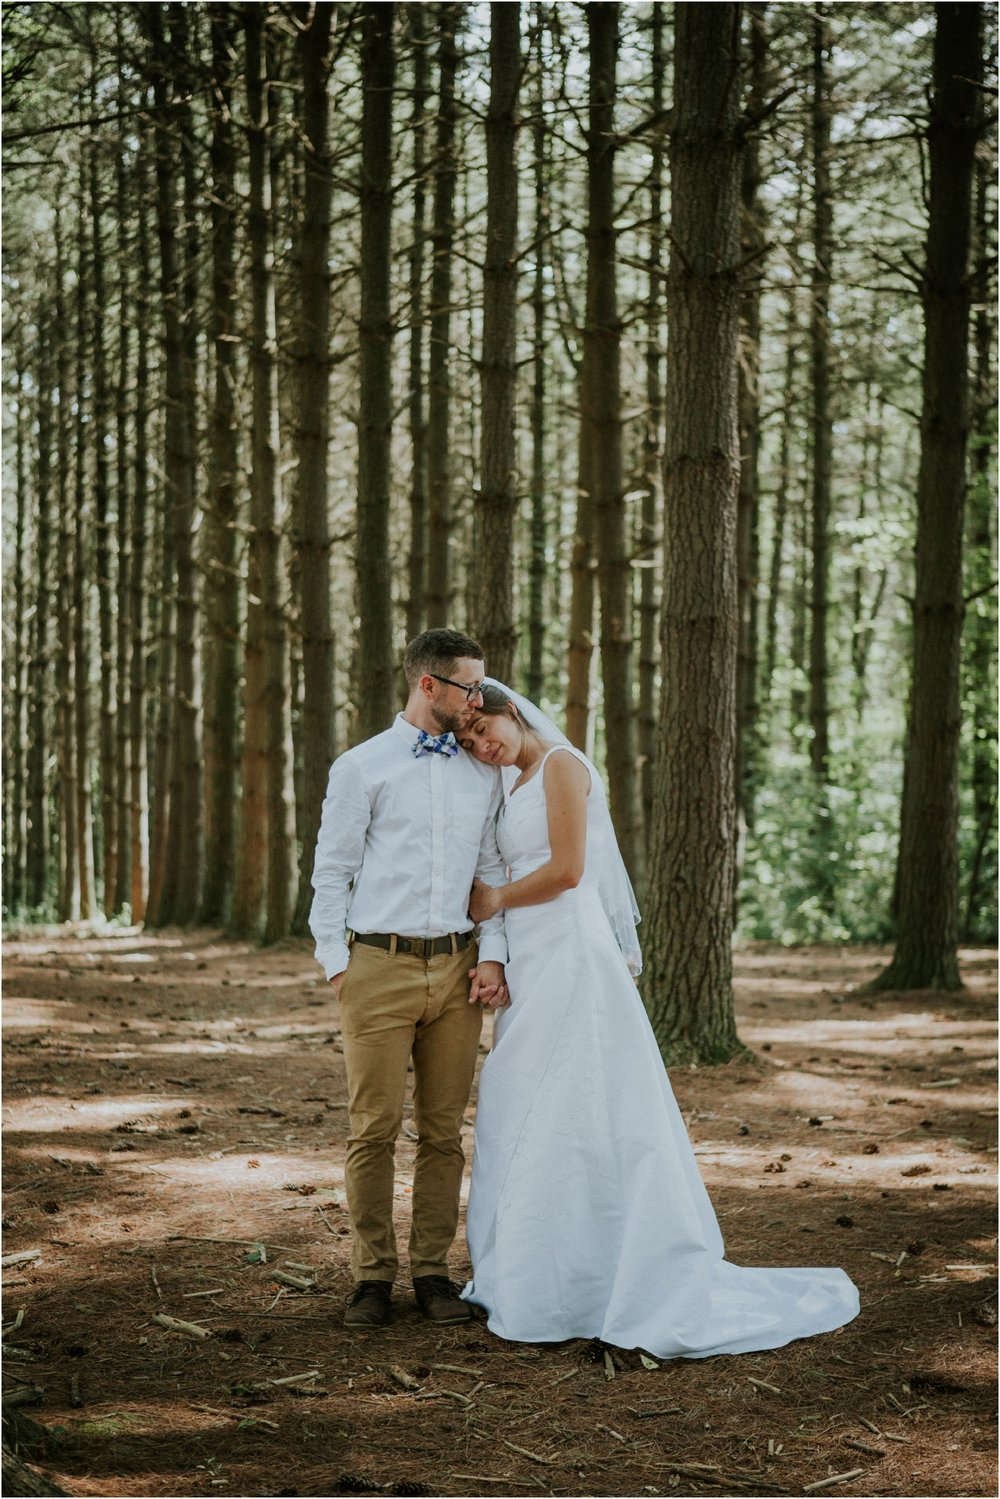 sugar-hollow-park-bristol-virginia-wedding-intimate-woodsy-black-forest-ceremony-adventurous-couple_0066.jpg